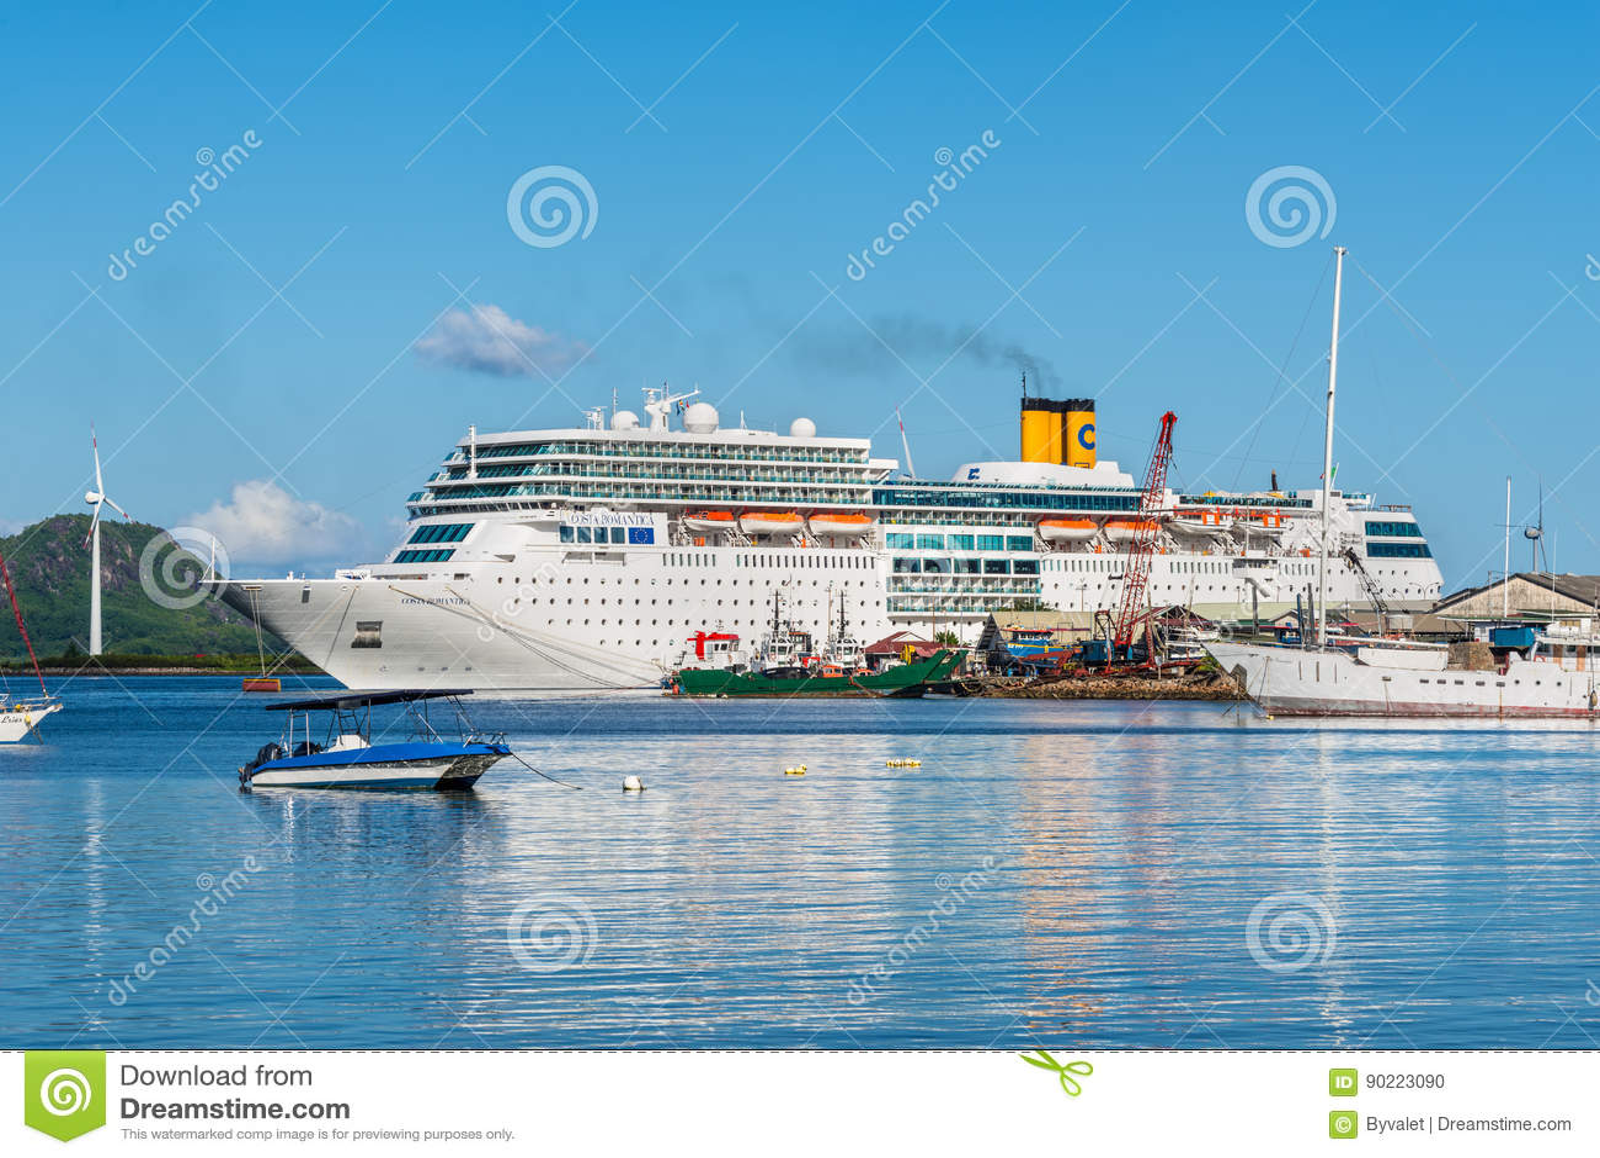 Costa Neoromantica Cruise Ship Editorial Image Image Of Ship Lifestyle 90223090